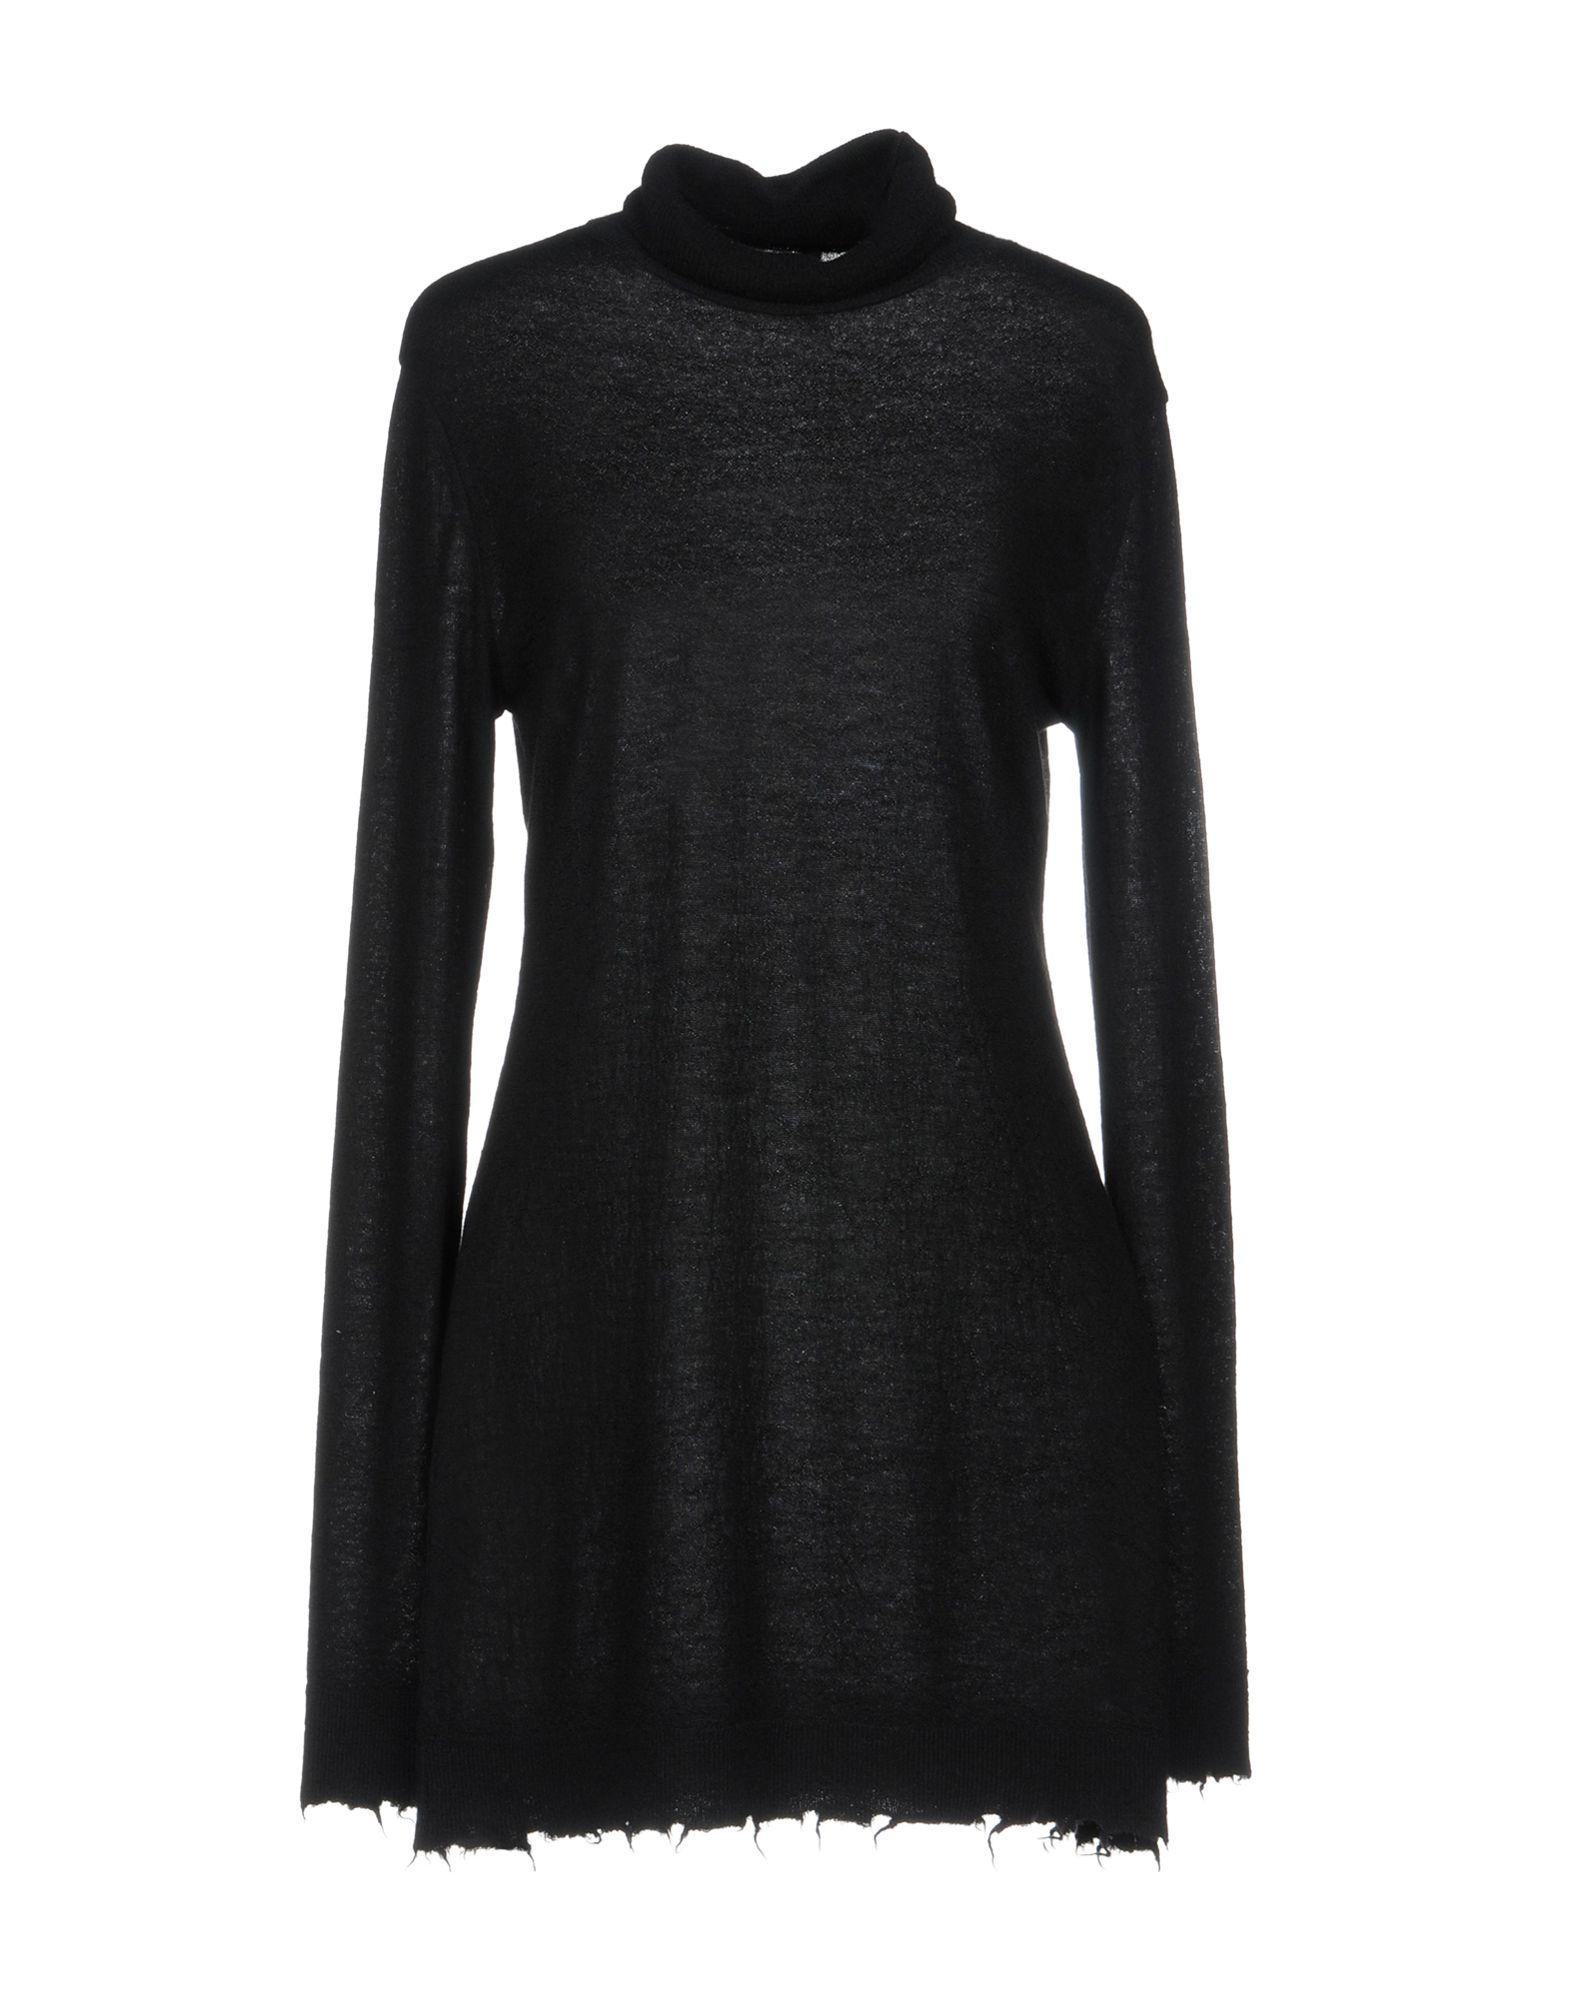 Фото - BEN TAVERNITI™ UNRAVEL PROJECT Короткое платье friday s project короткое платье